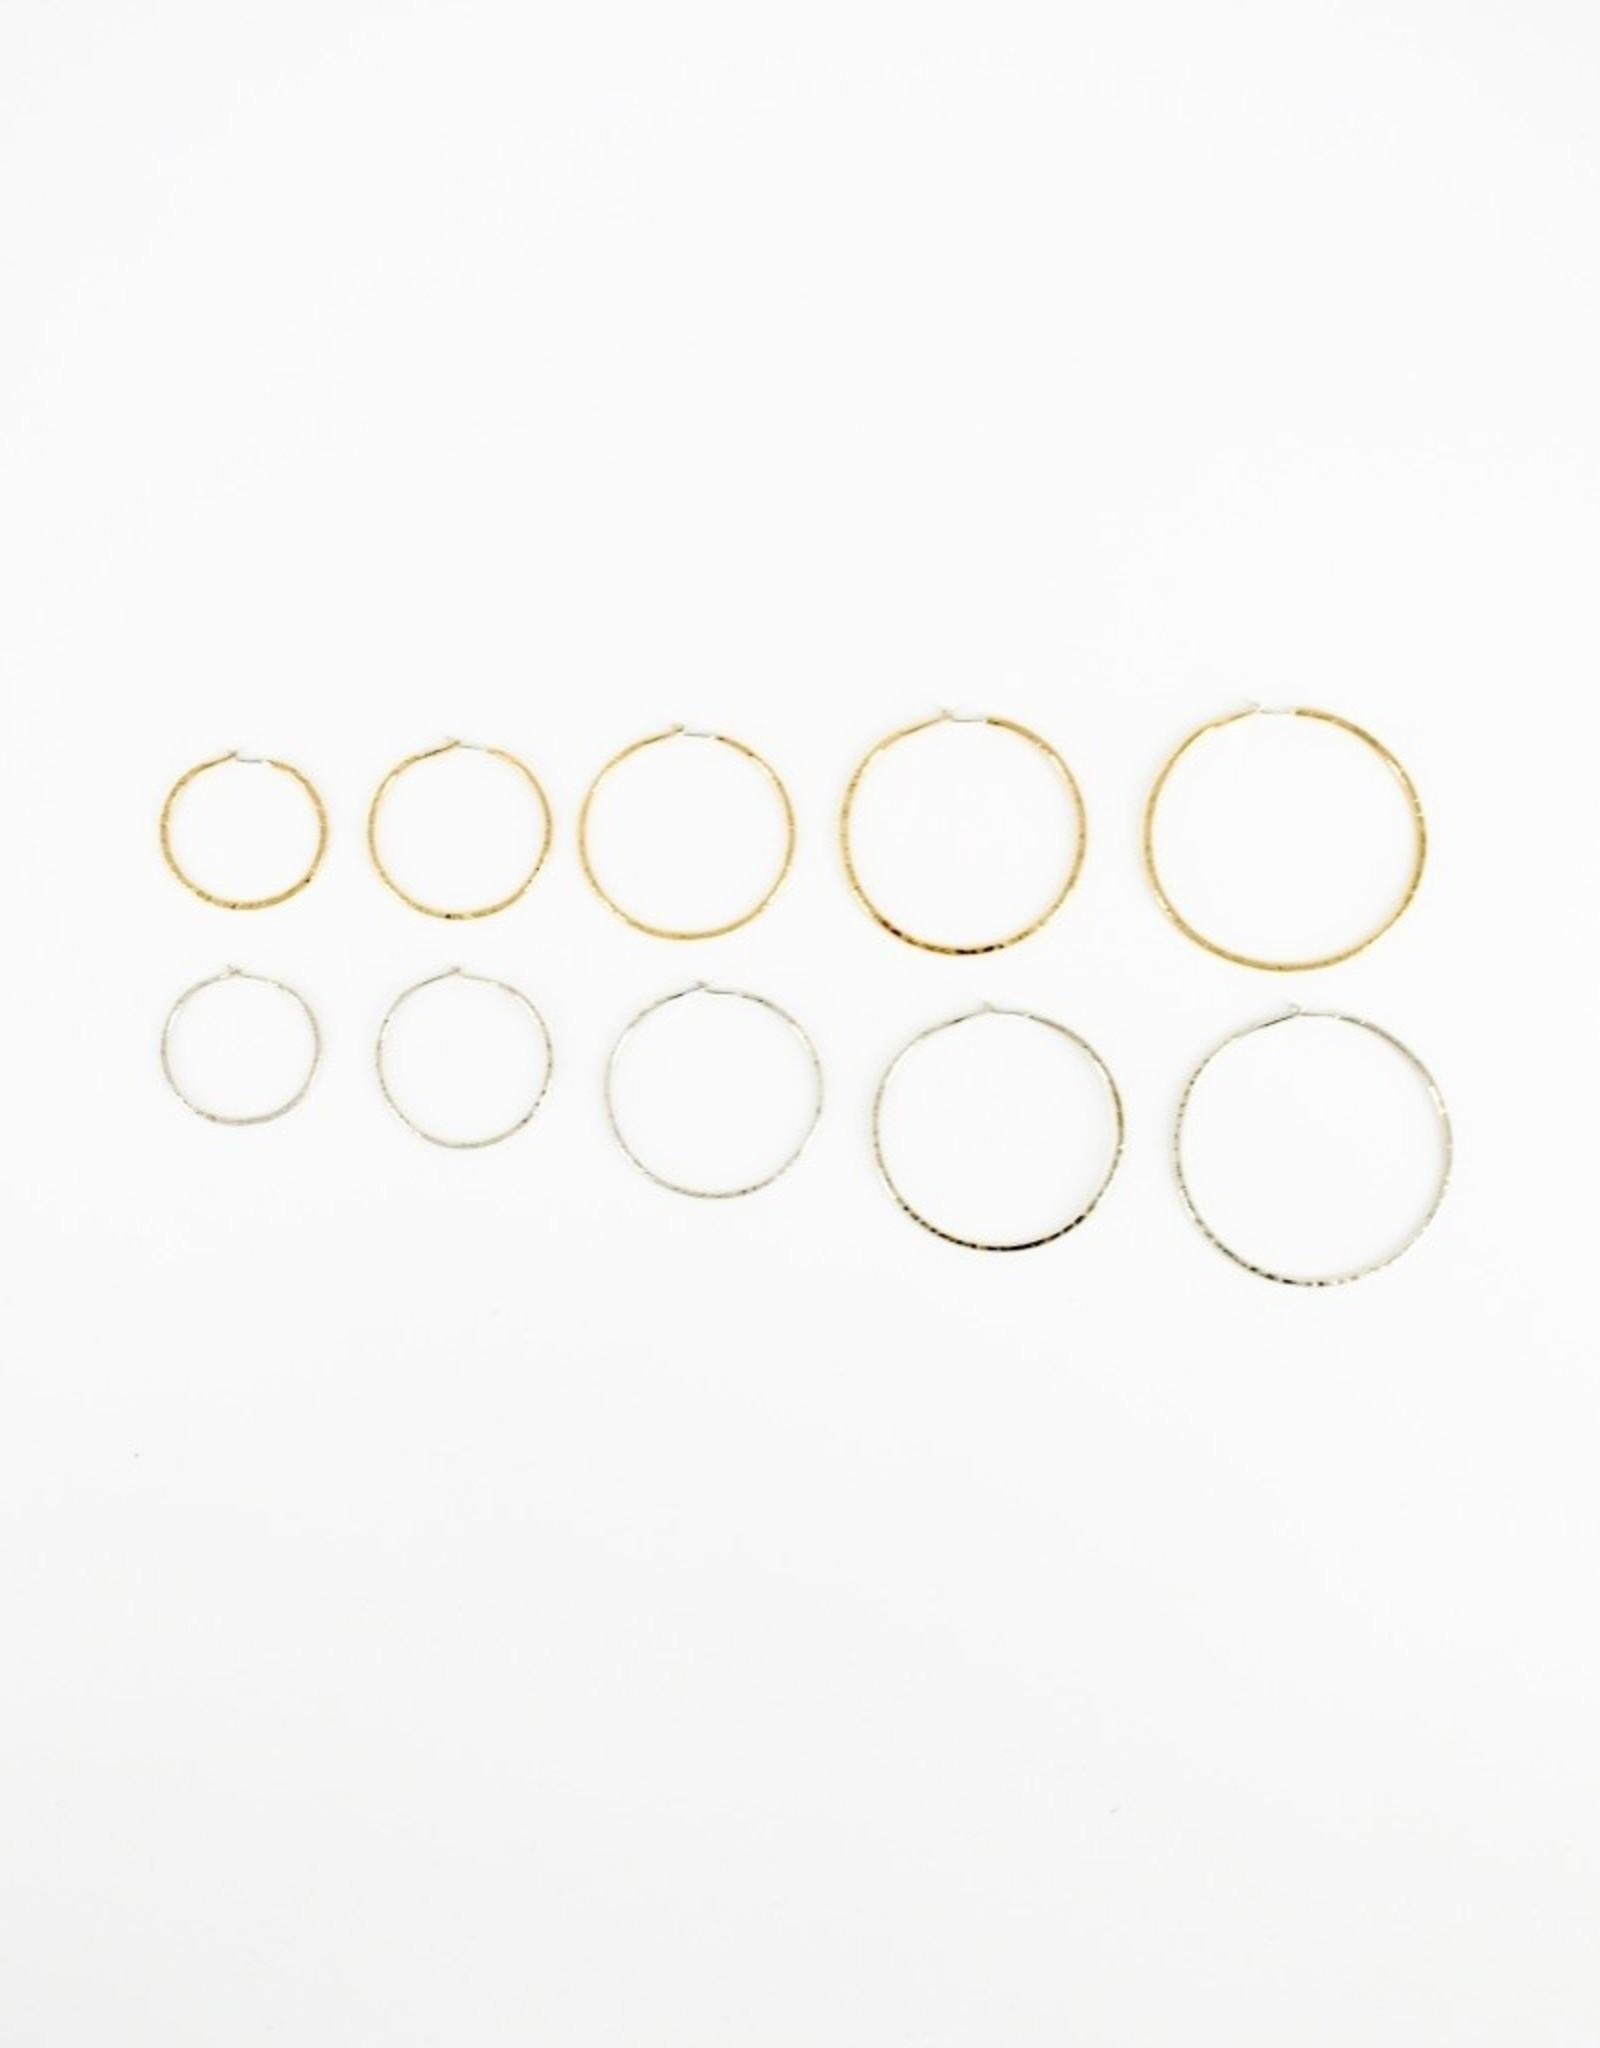 STONELEAF Hammered Gold Hoop Earring